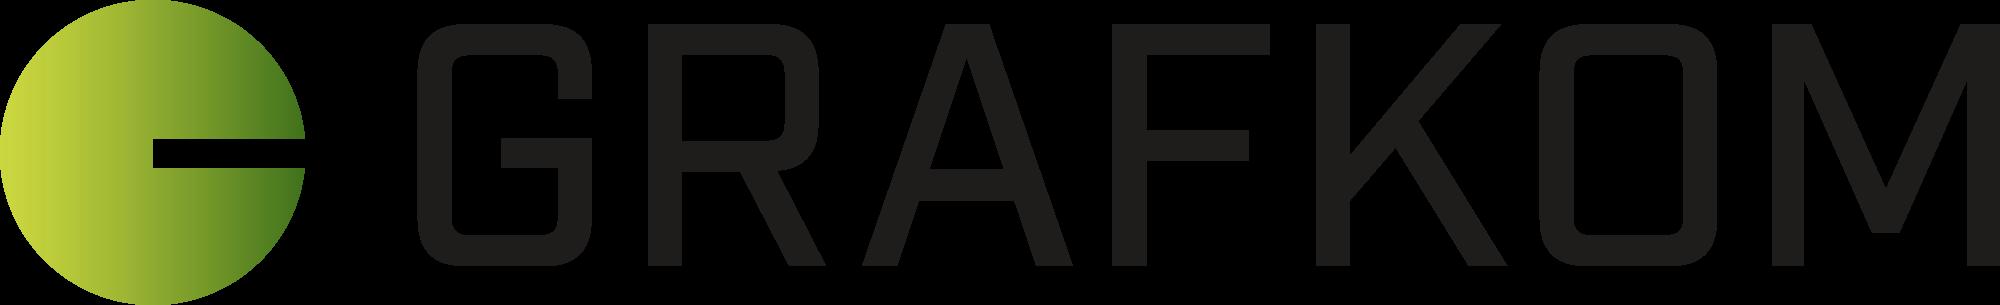 Grafkom-logo